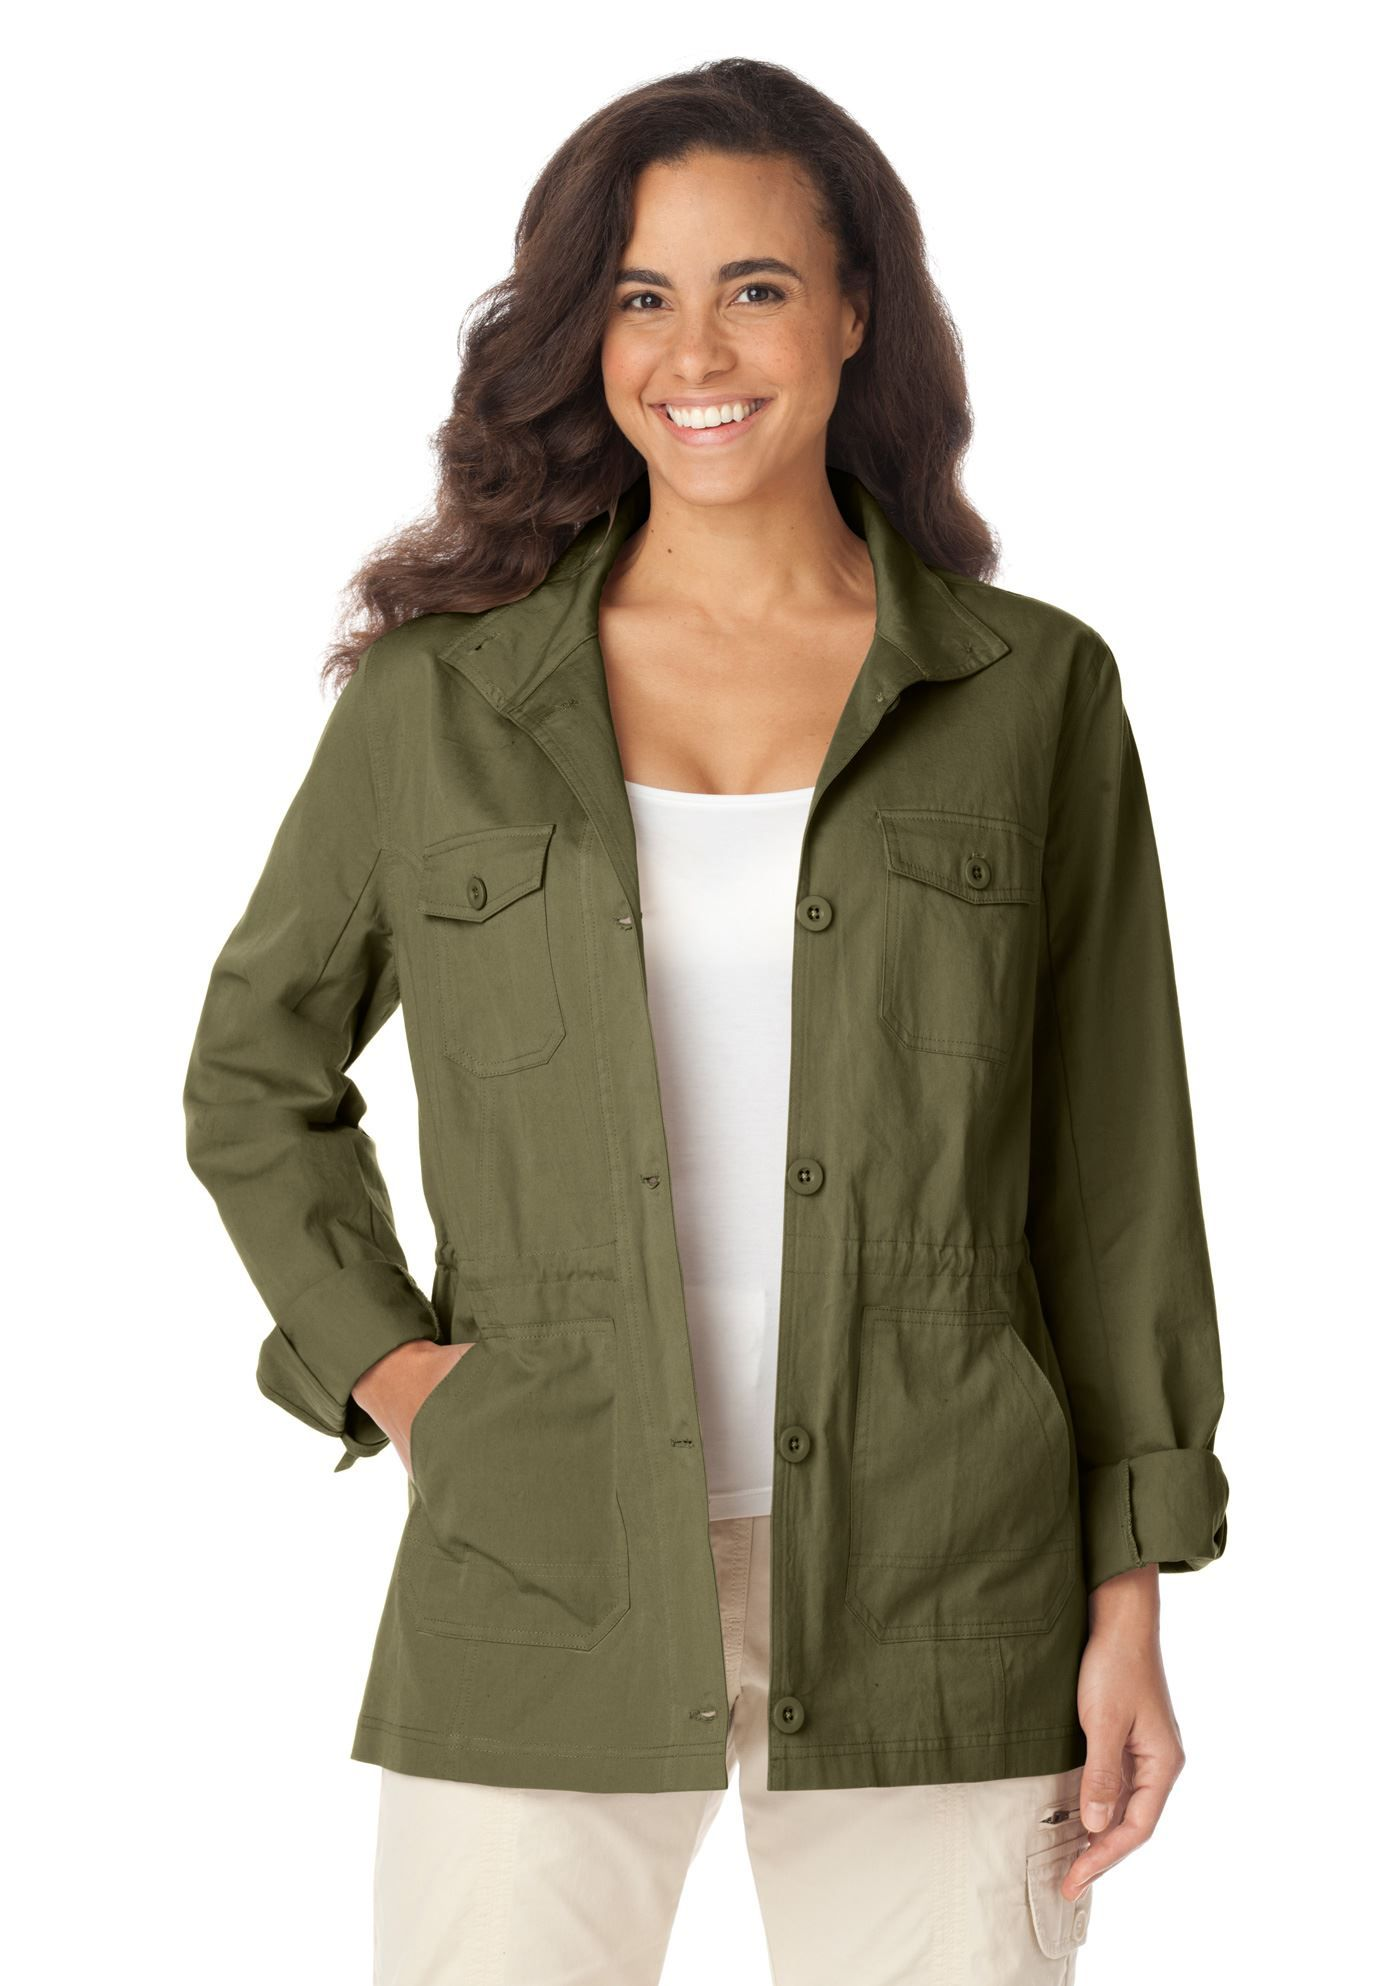 Plus Size Sport twill jacket WWIdealSummer Twill jacket